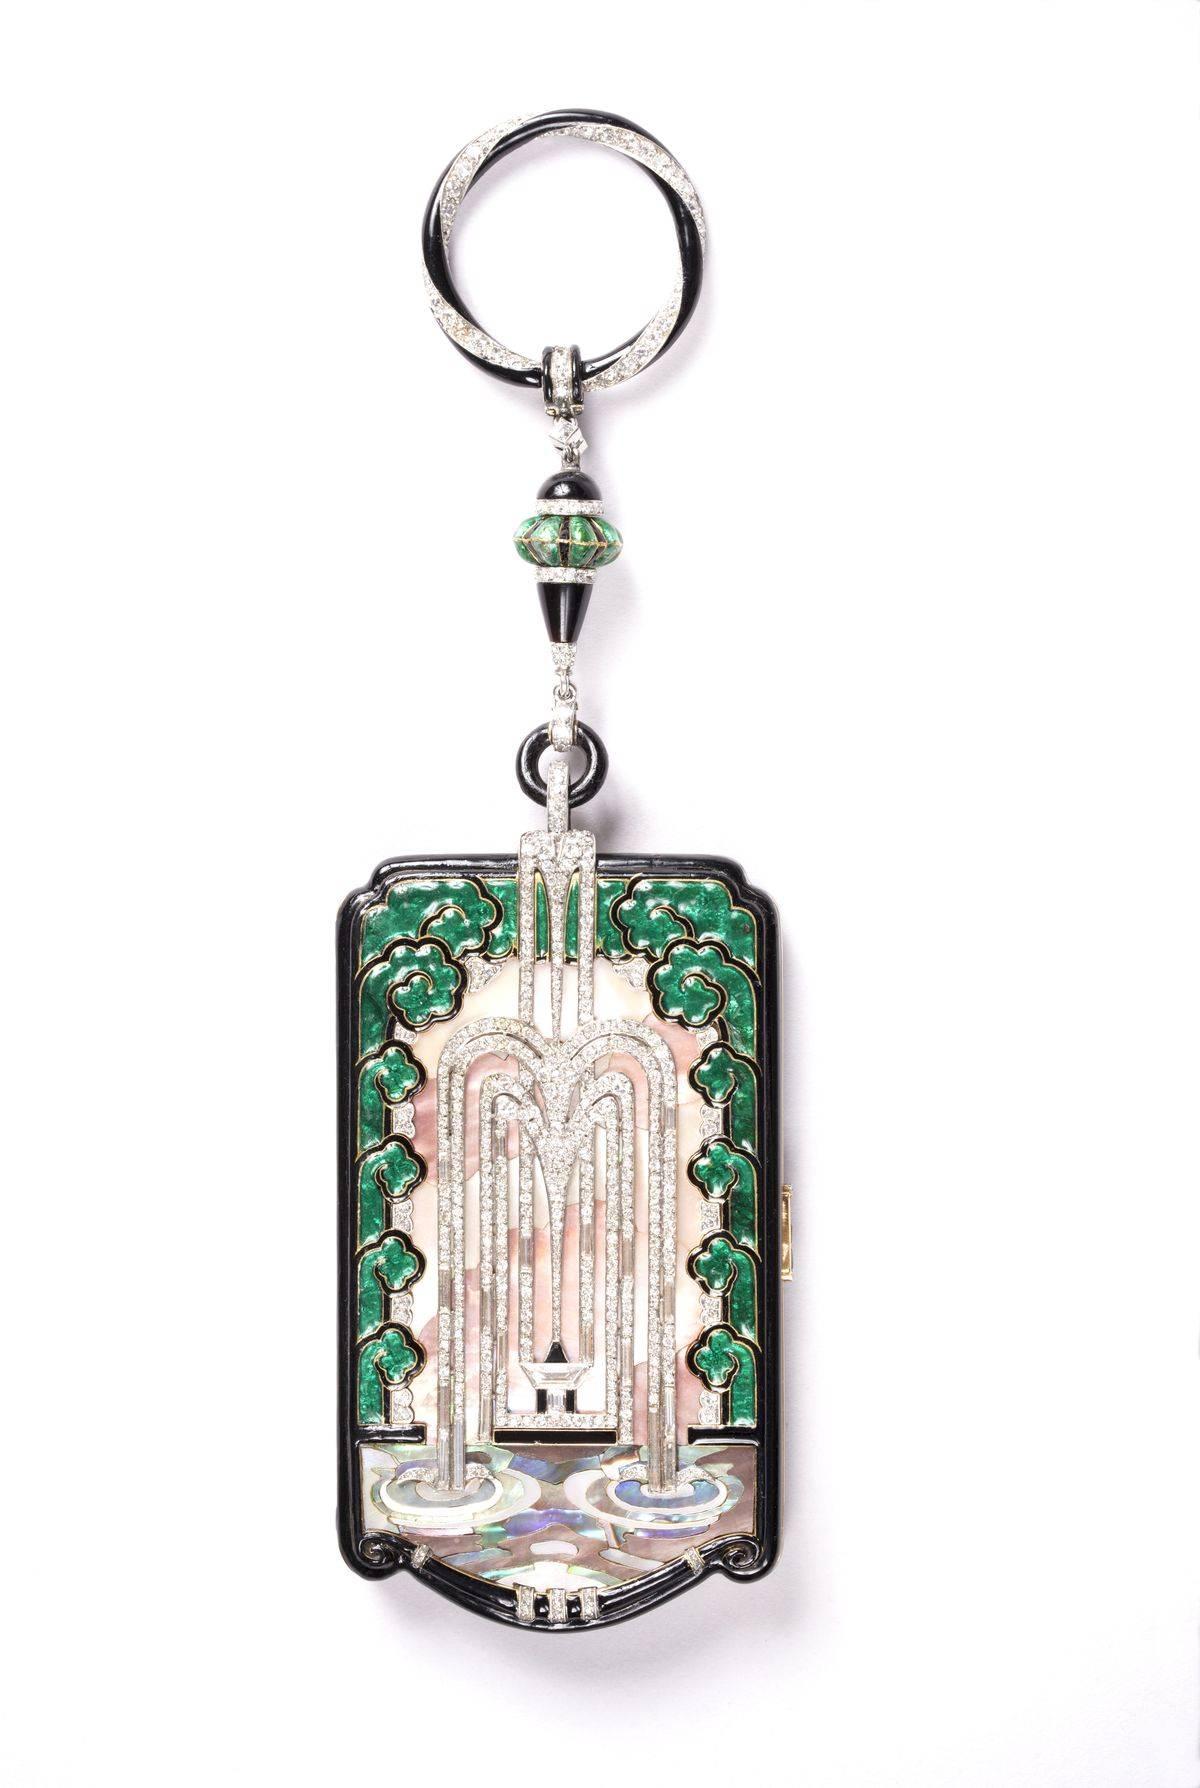 Art deco jewelry-293437731962192747